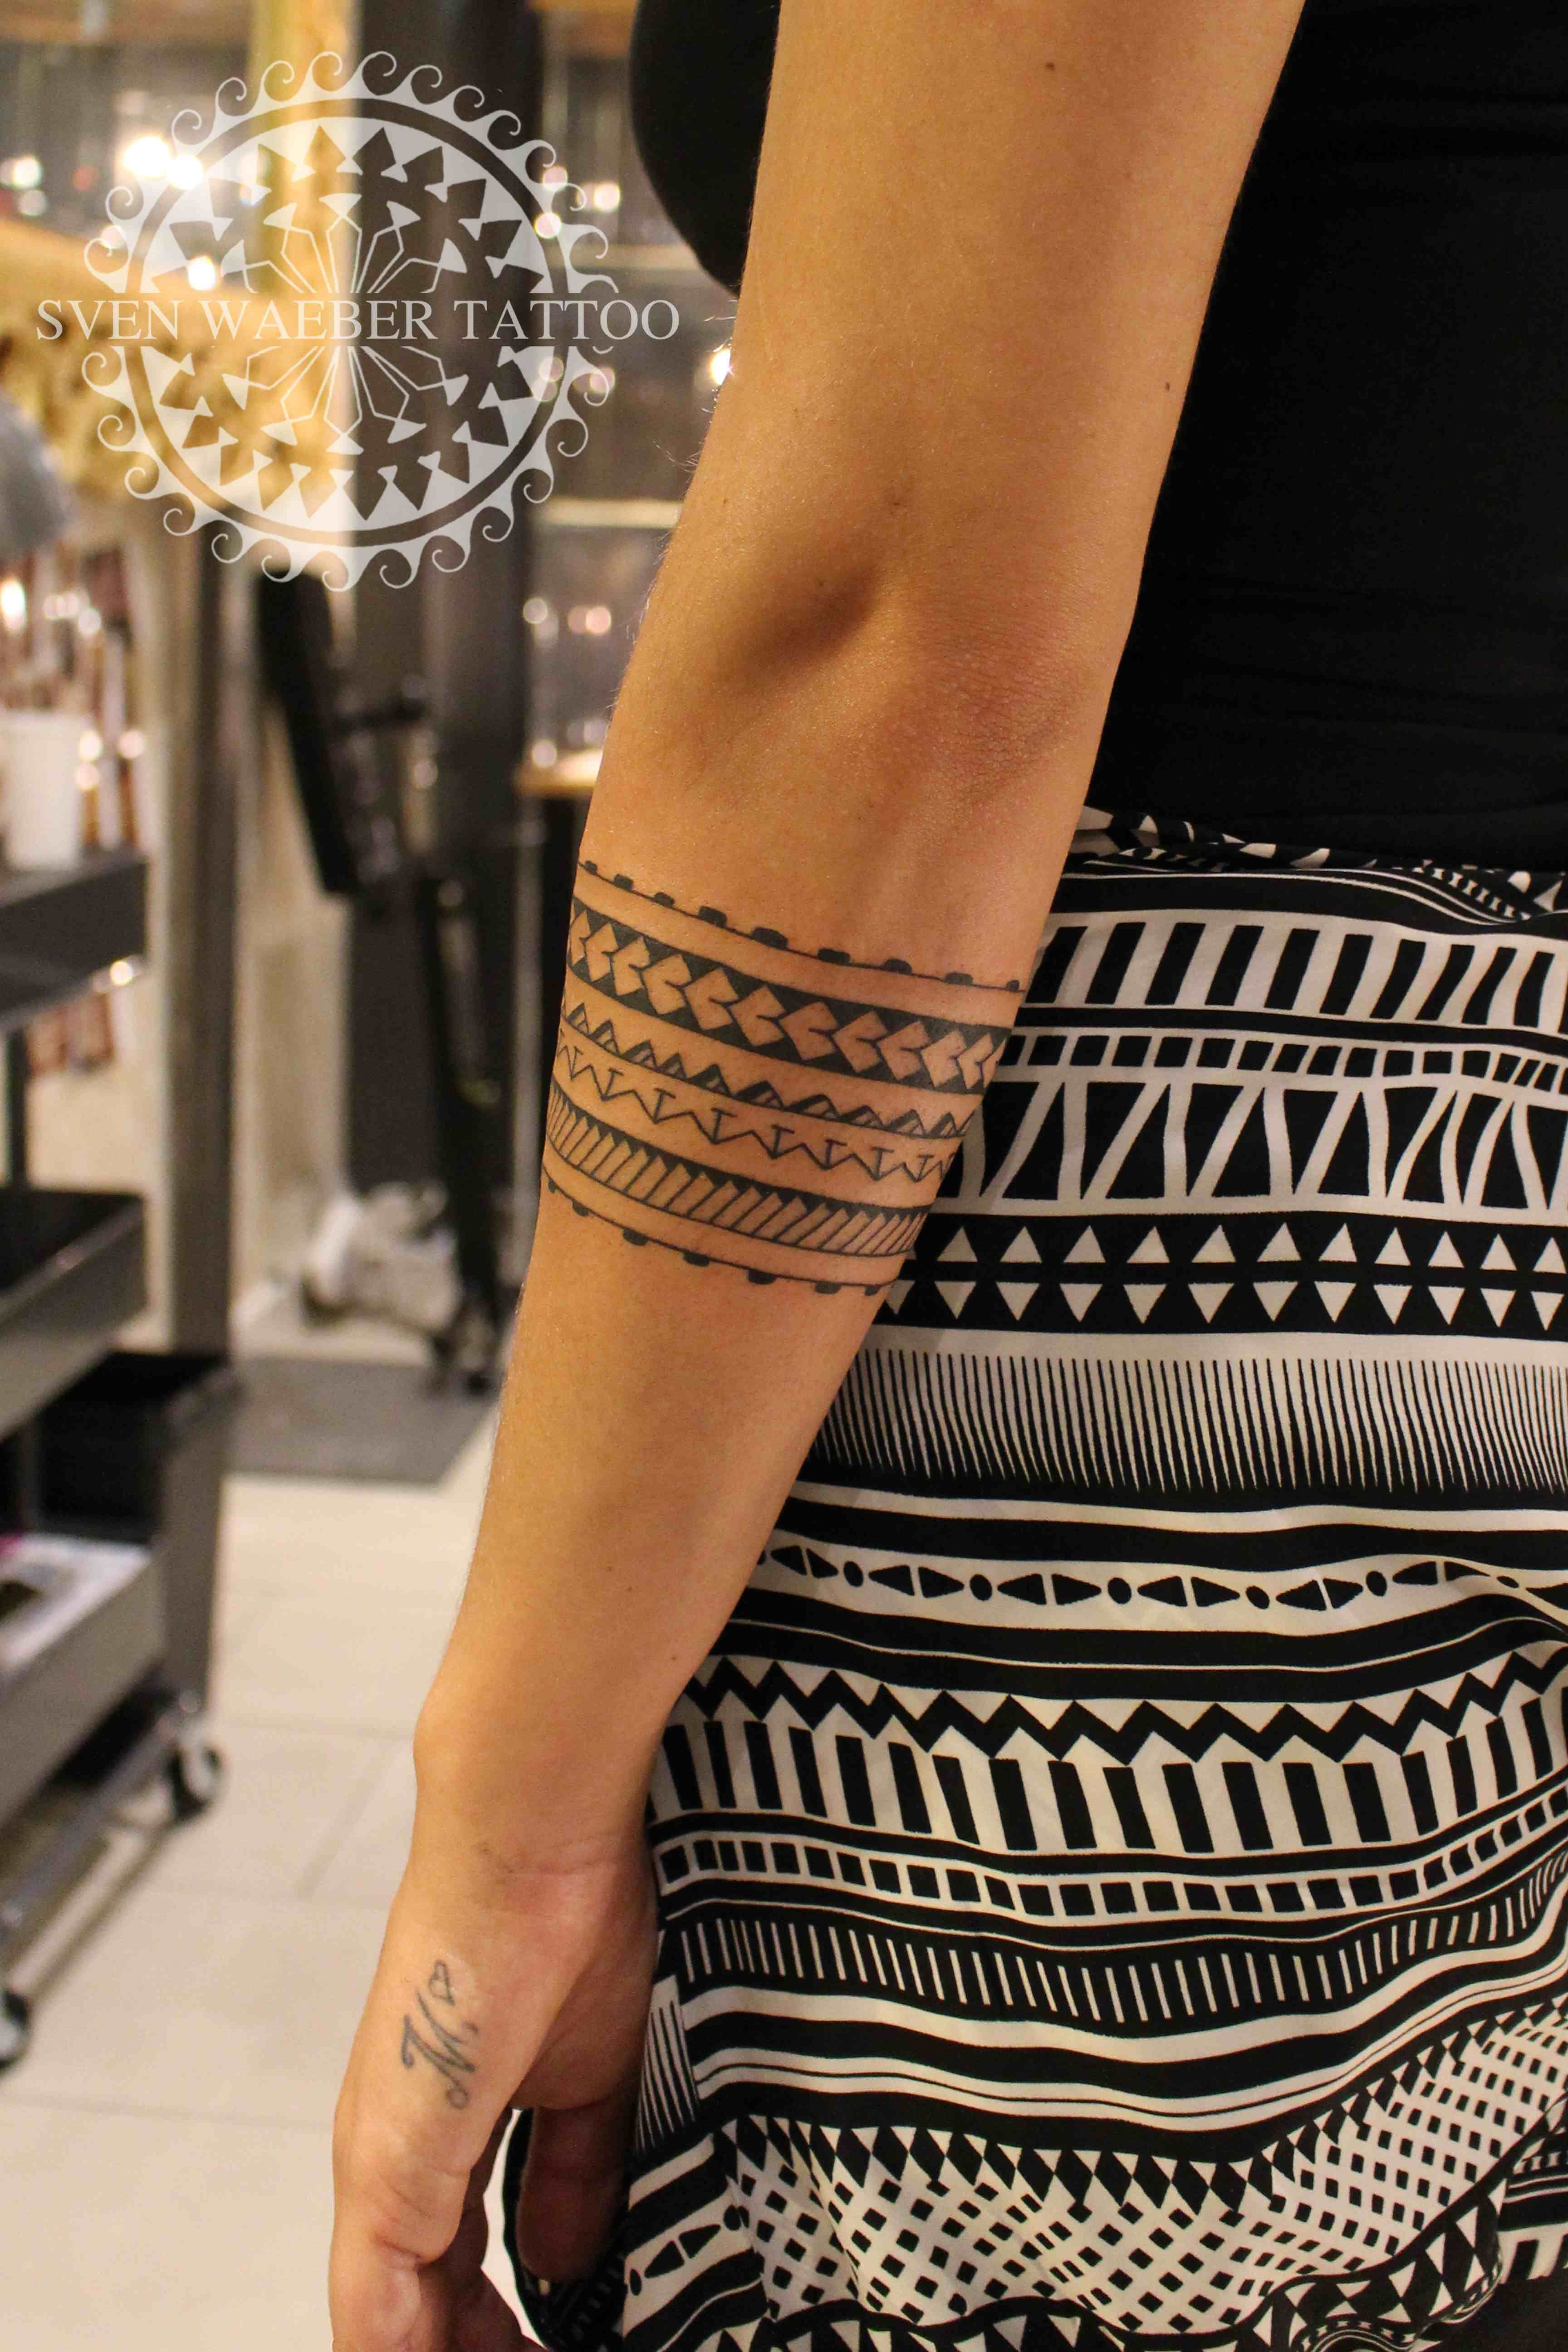 Vorarm Mmhendi Comme Manhunter Setting Manhattan Project Planete Tattoo Est Elle Aussi Regul In 2020 Maori Tattoo Polynesian Tattoos Women Forearm Band Tattoos